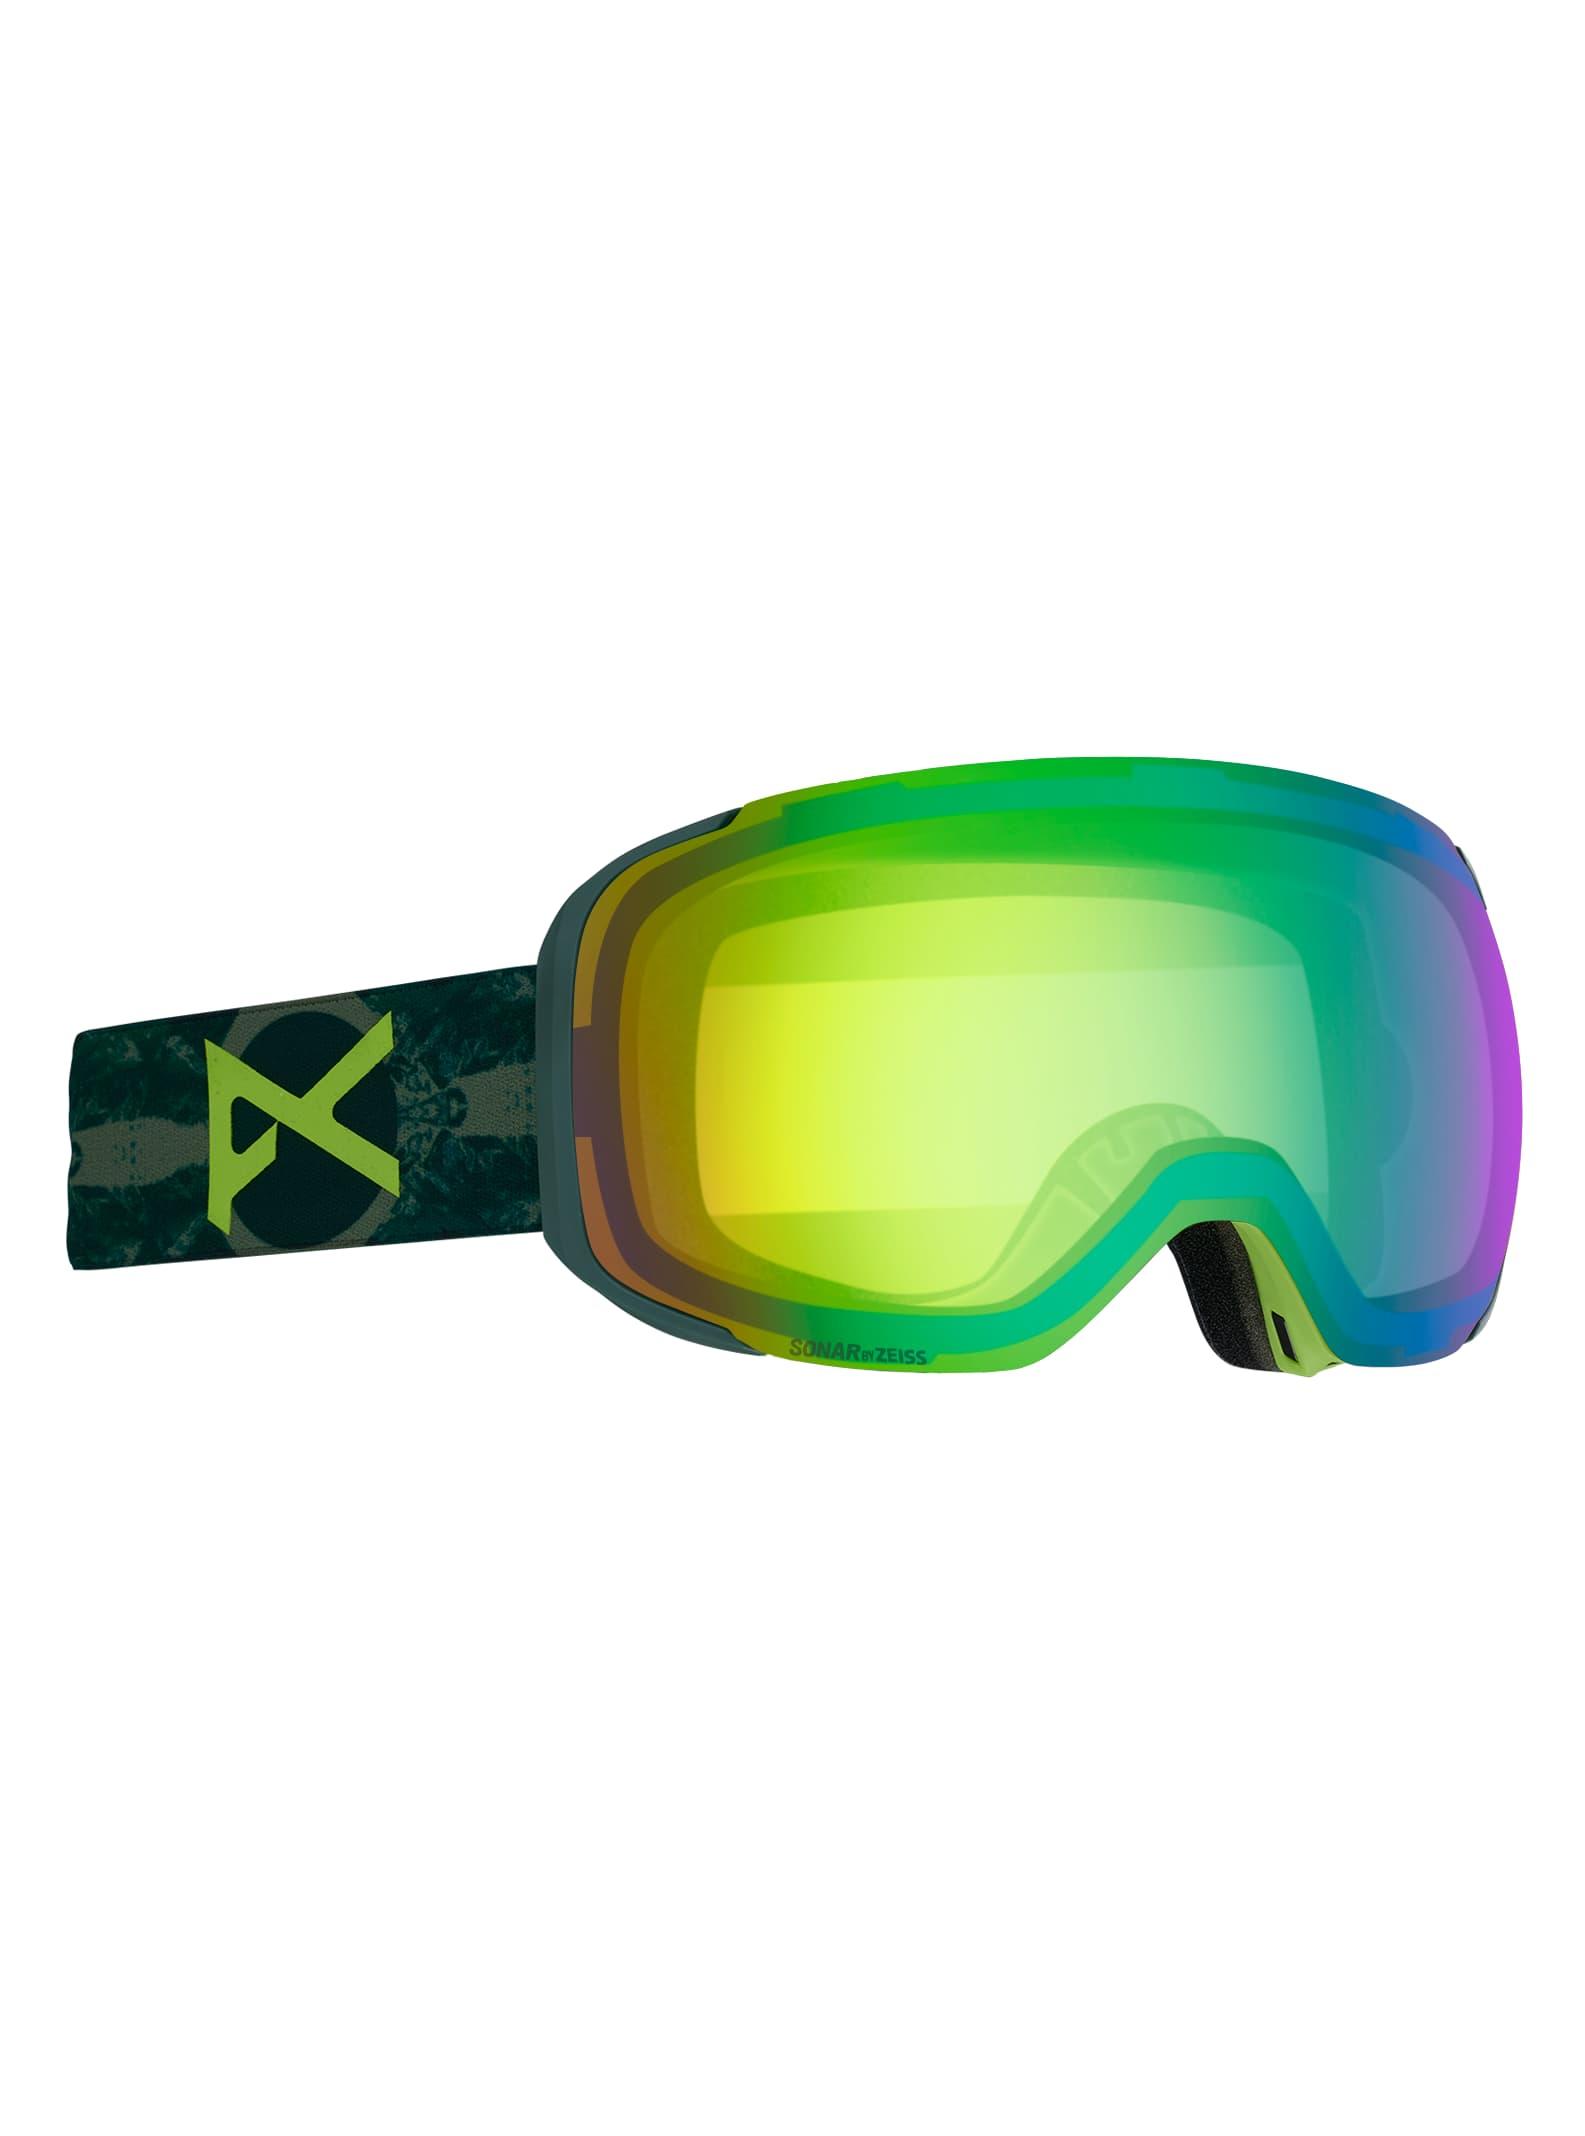 Anon Men's M2 Goggle + Spare Lens, Frame: Deer Mountain, Lens: SONAR Green, Spare Lens: SONAR Smoke